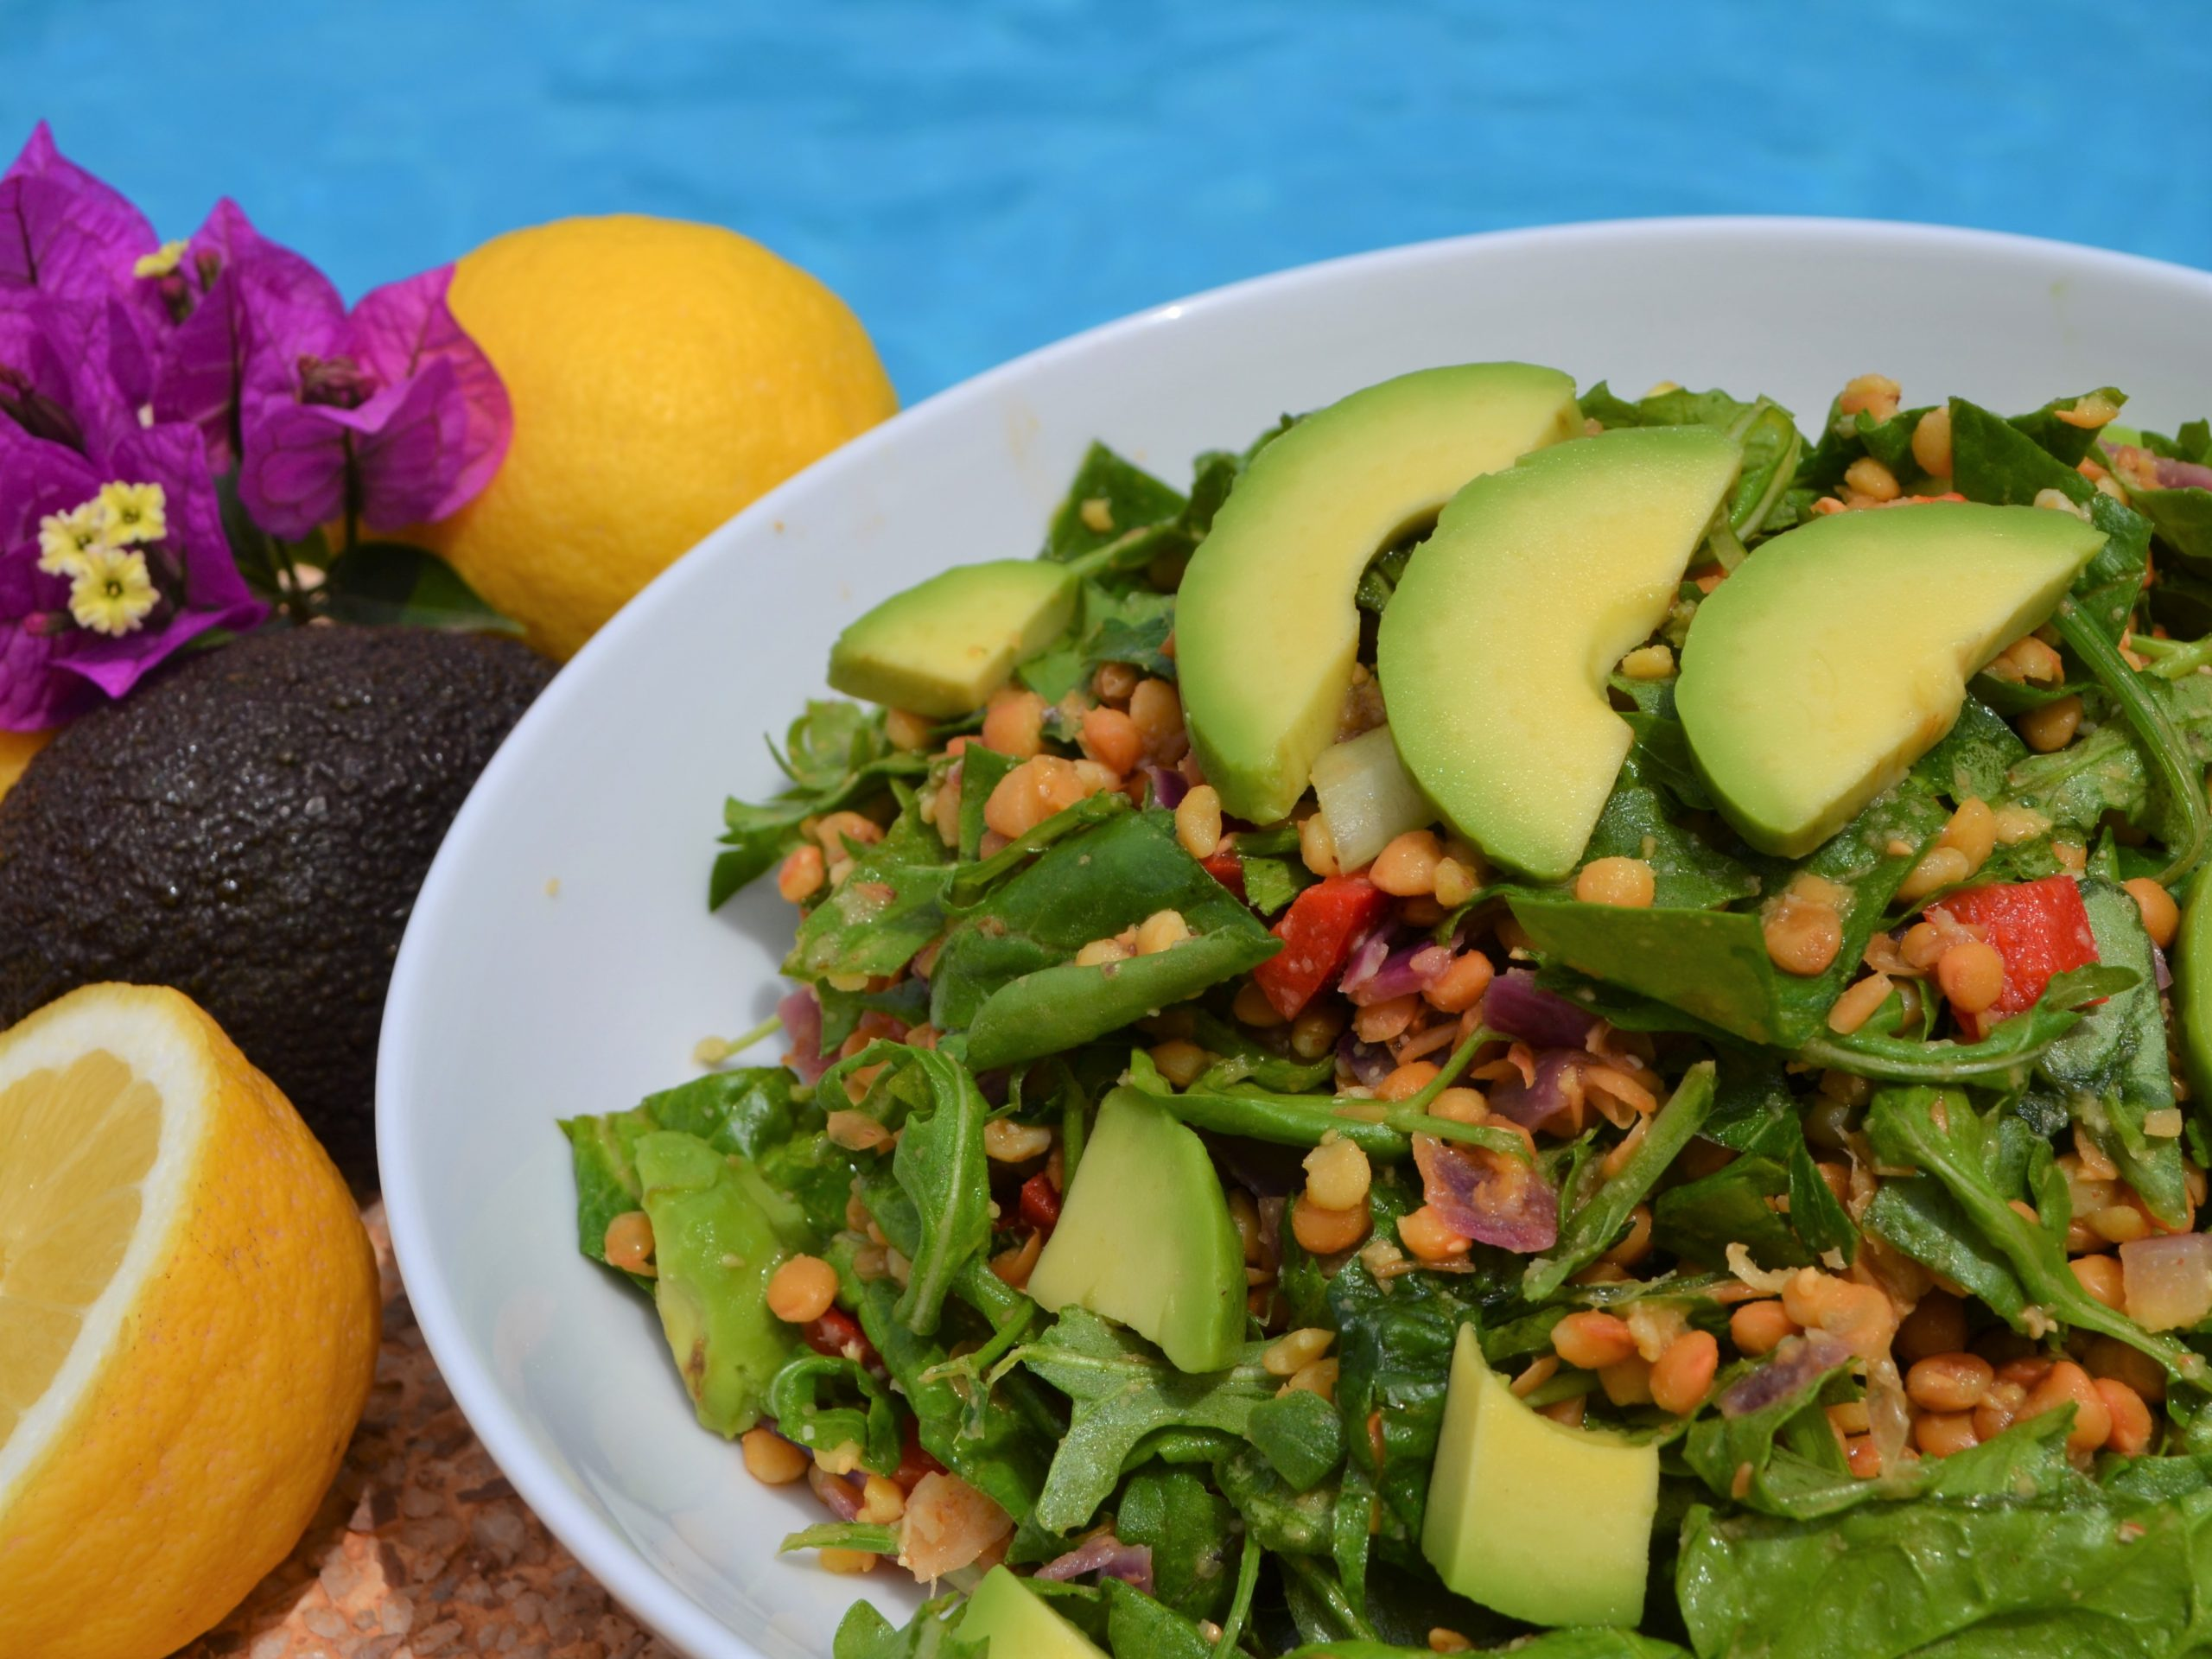 Vegan lentil salad recipe plantbased nutrition La Crisalida